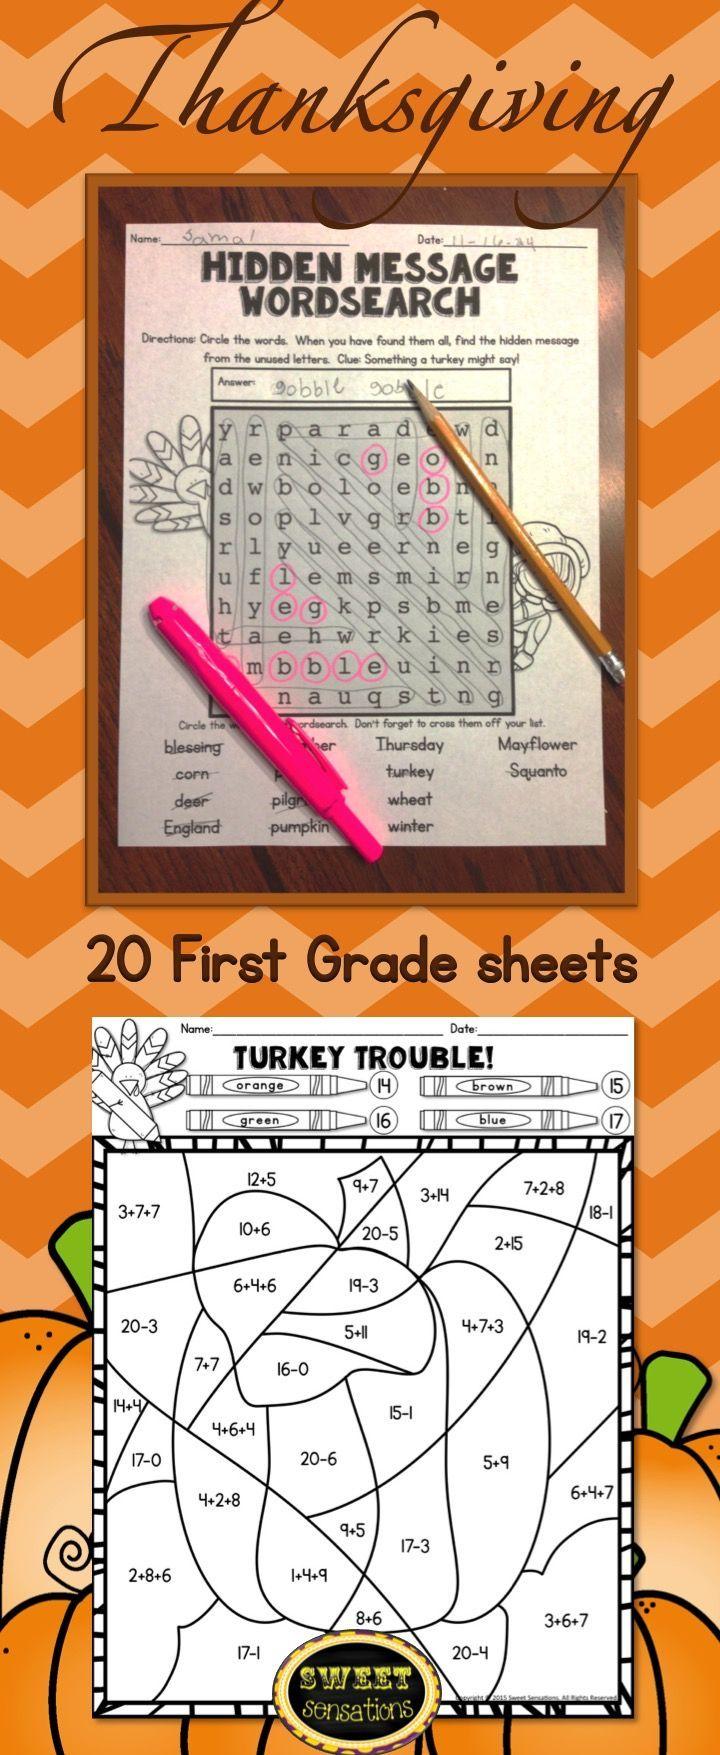 First Grade Thanksgiving Worksheets School celebration